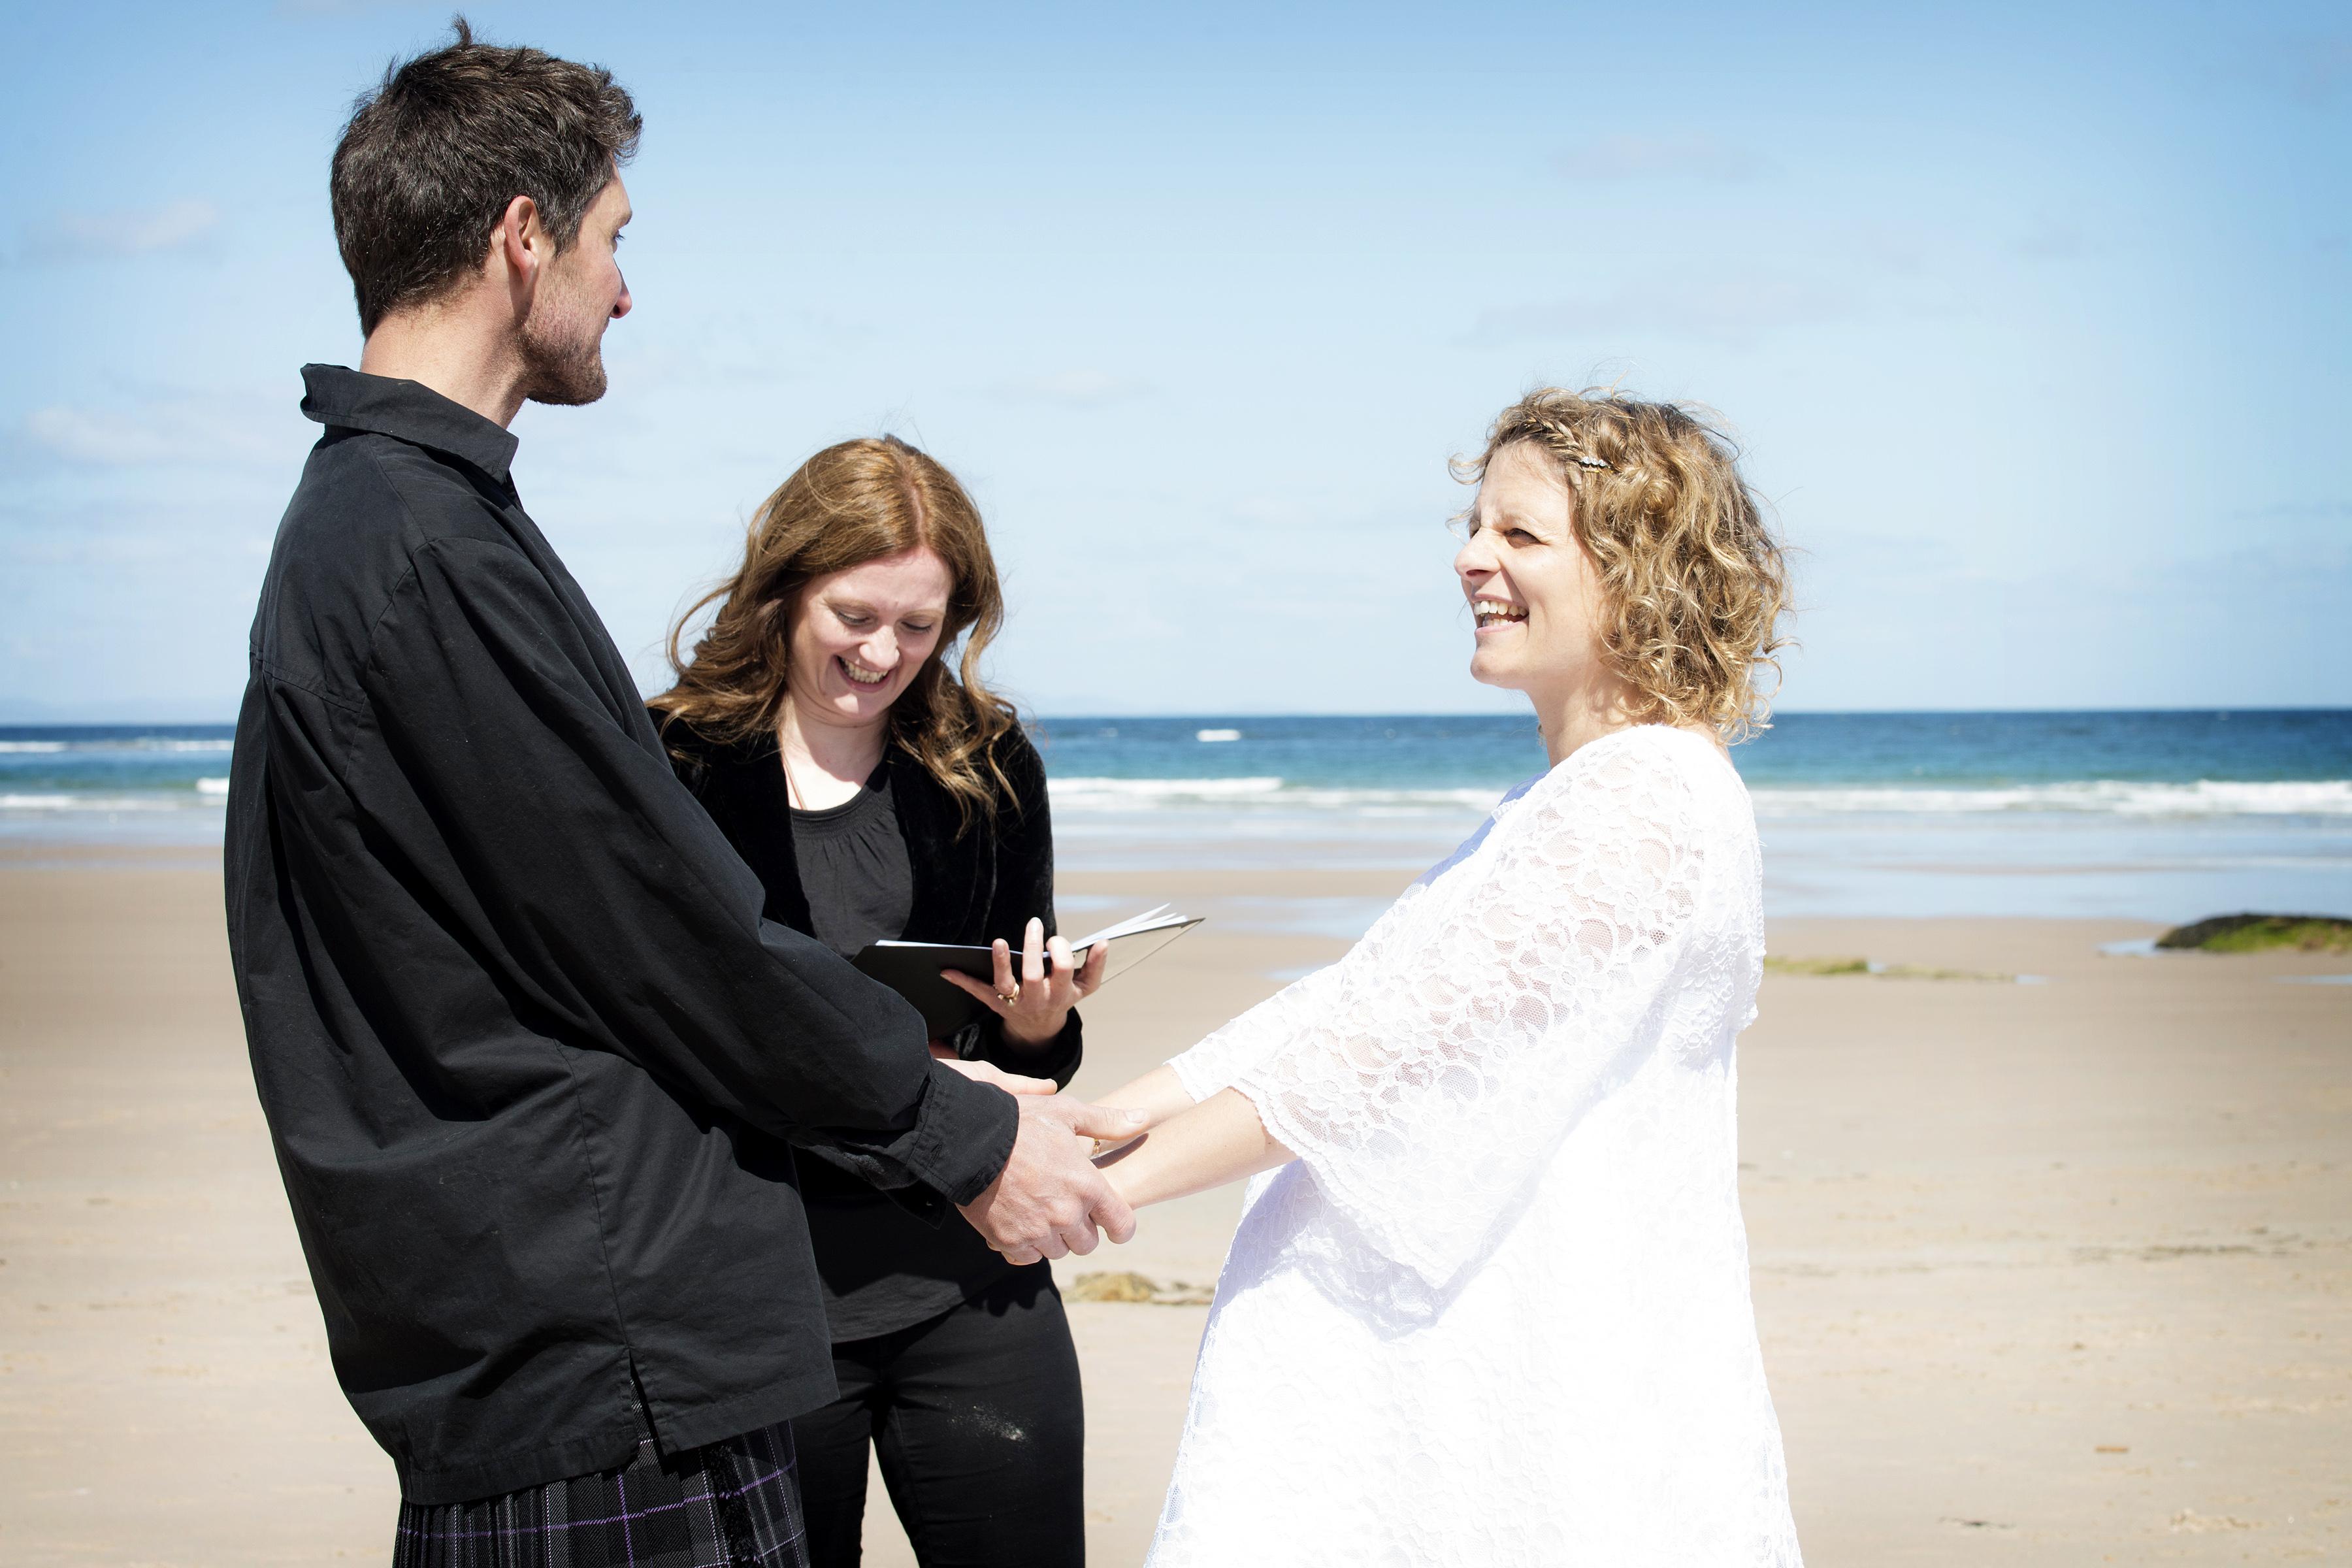 handcrafted ceremonies wedding celebrant humanist wedding elgin moray